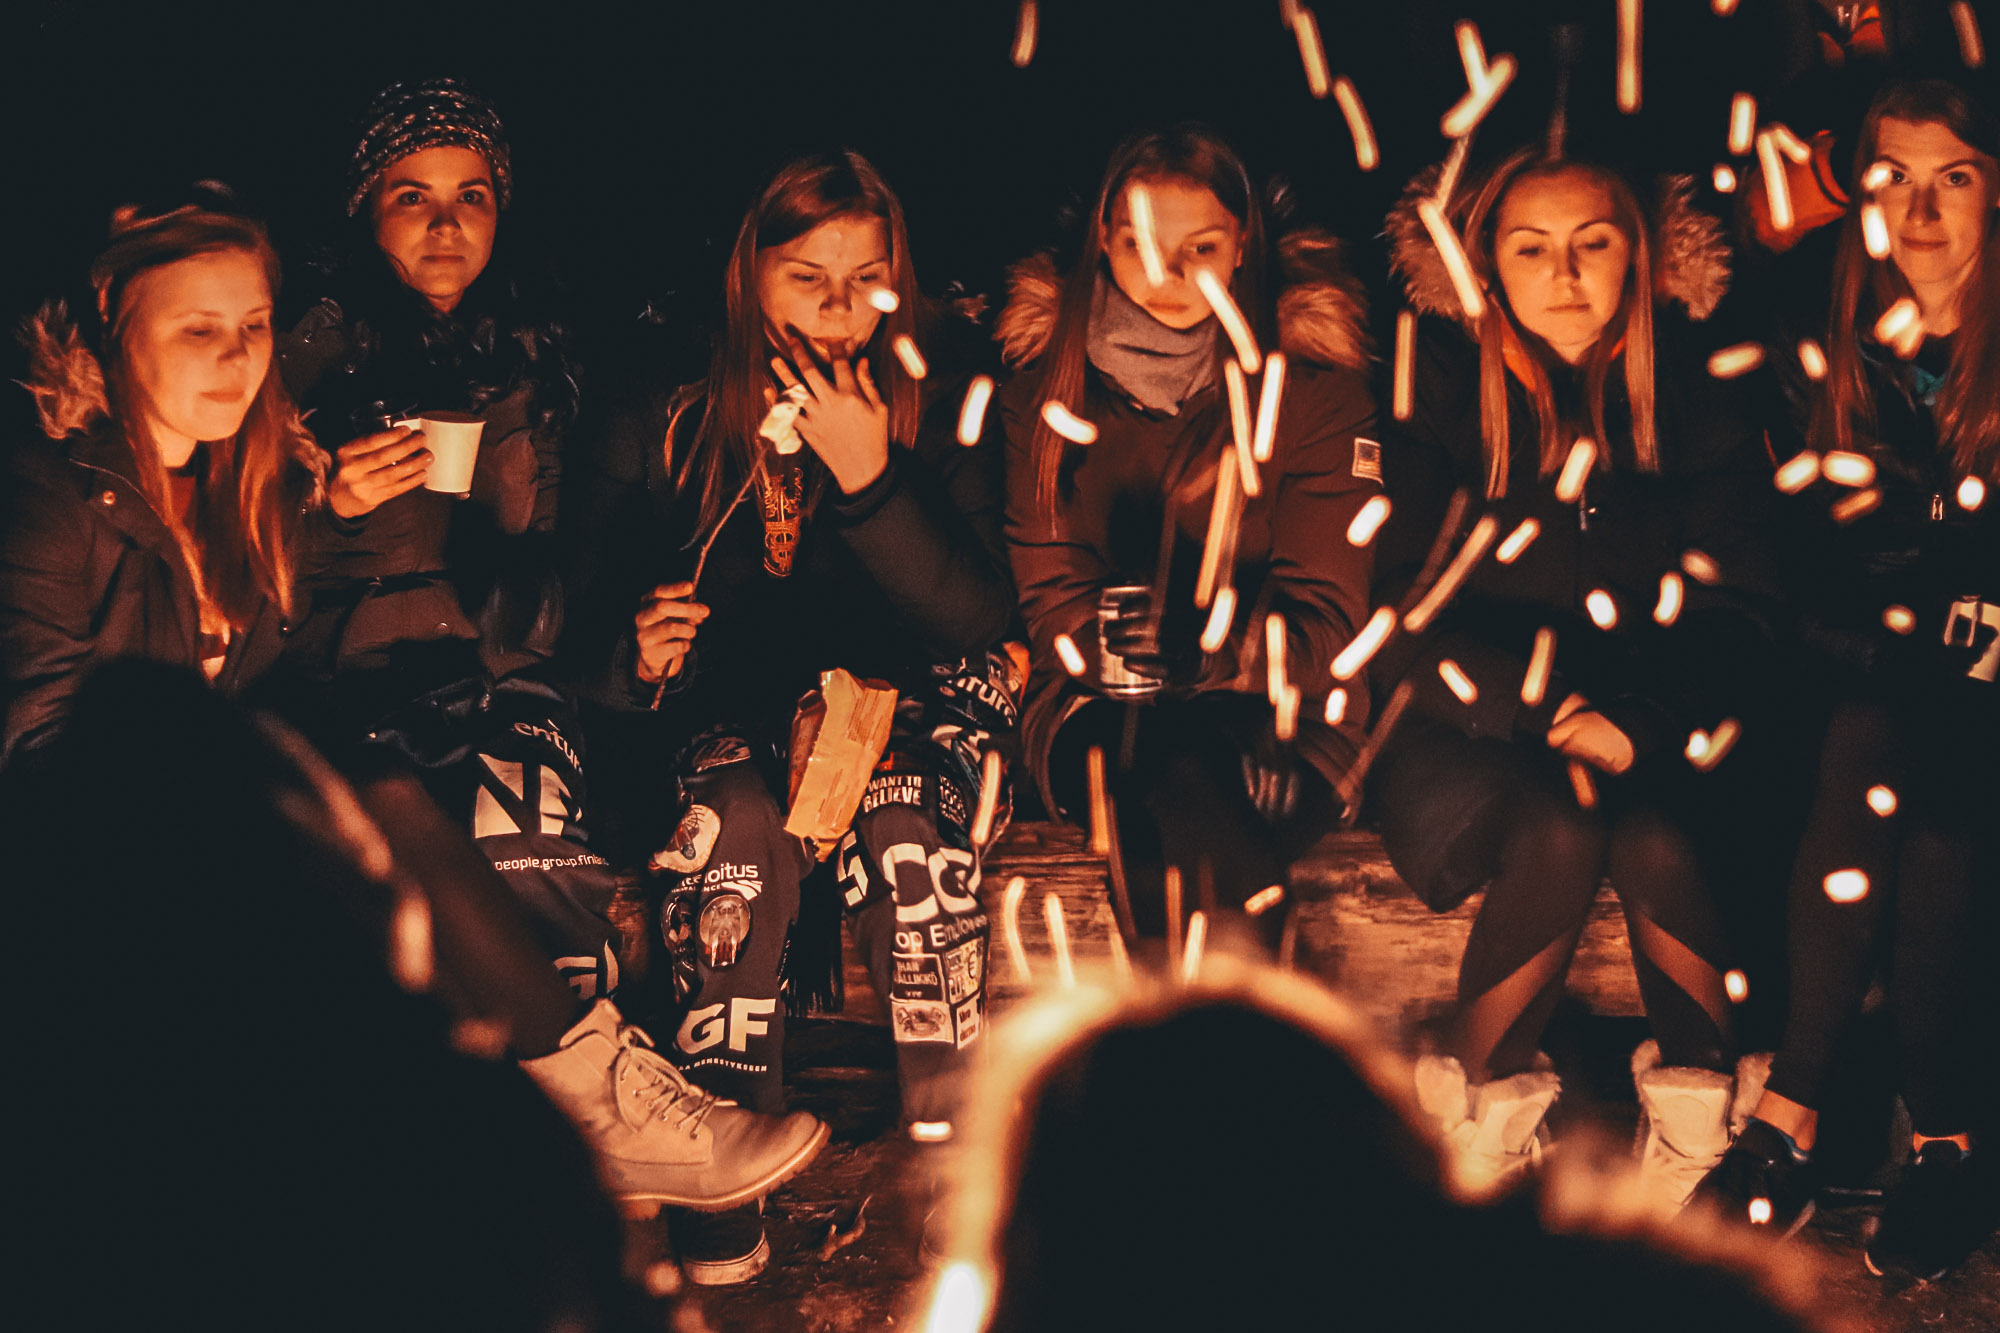 Campfire - ethan-hu-590389-unsplash.jpg